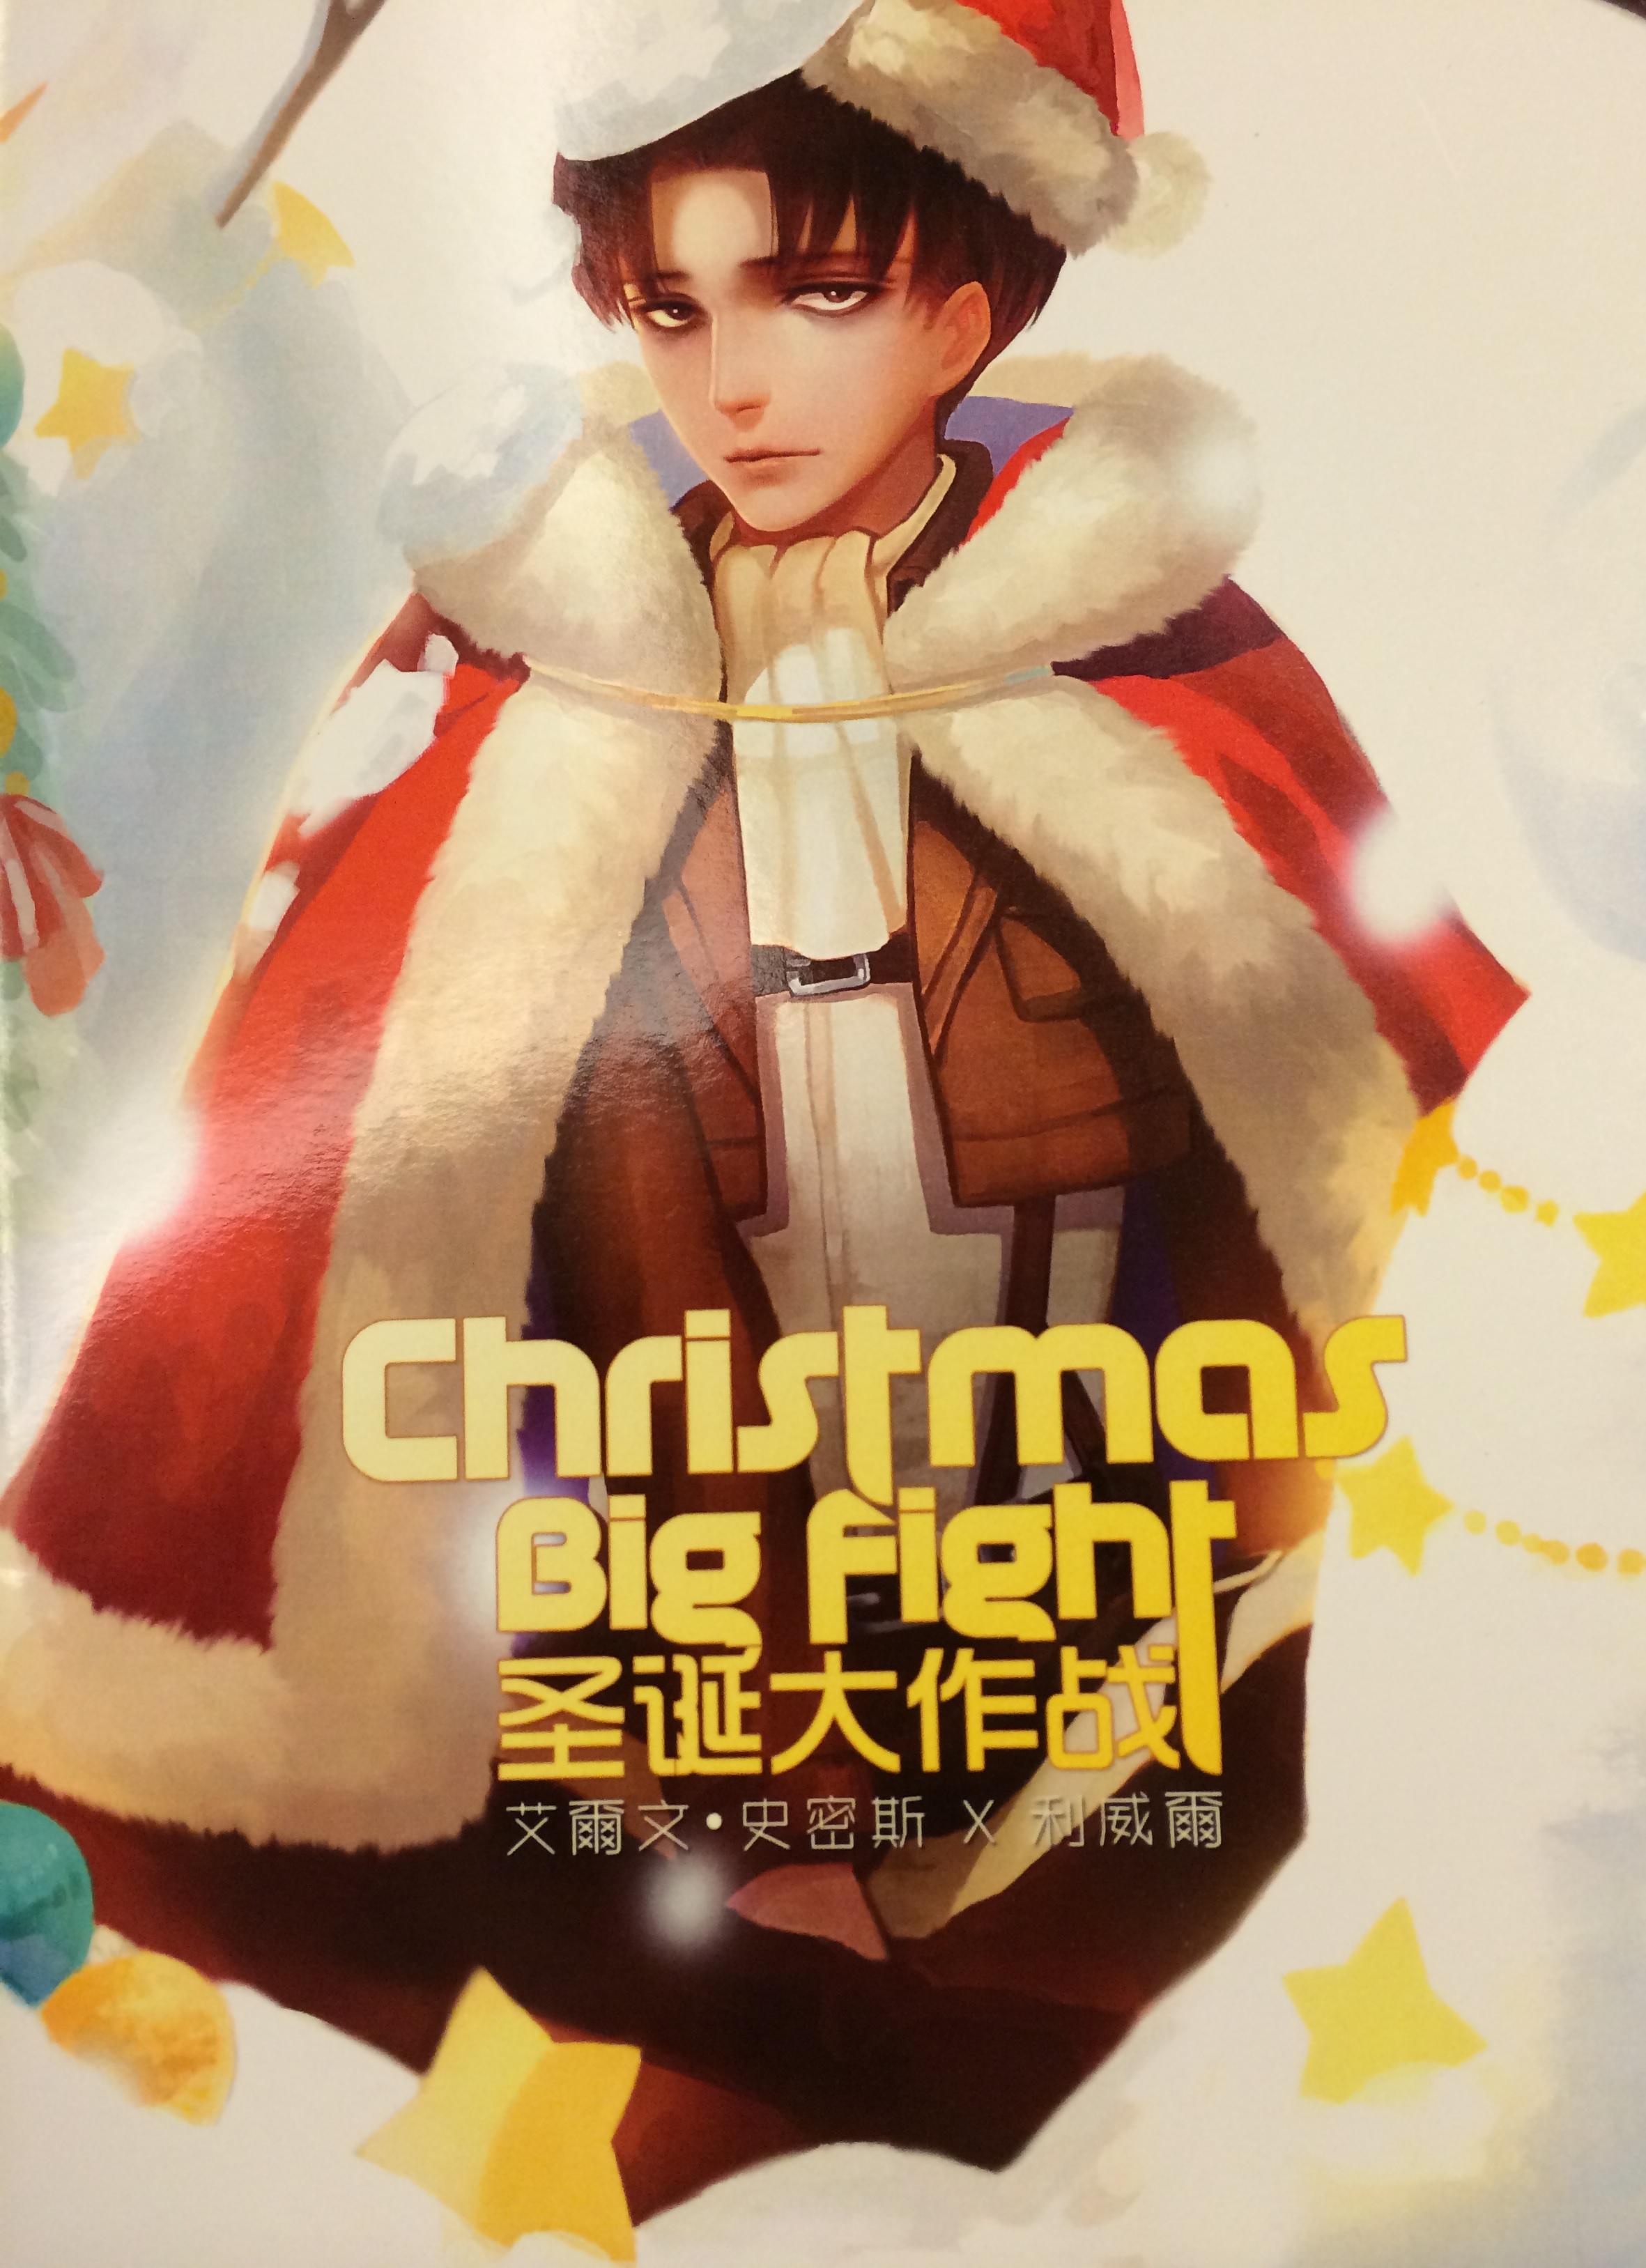 Christmas Big Fight 聖誕大作戰